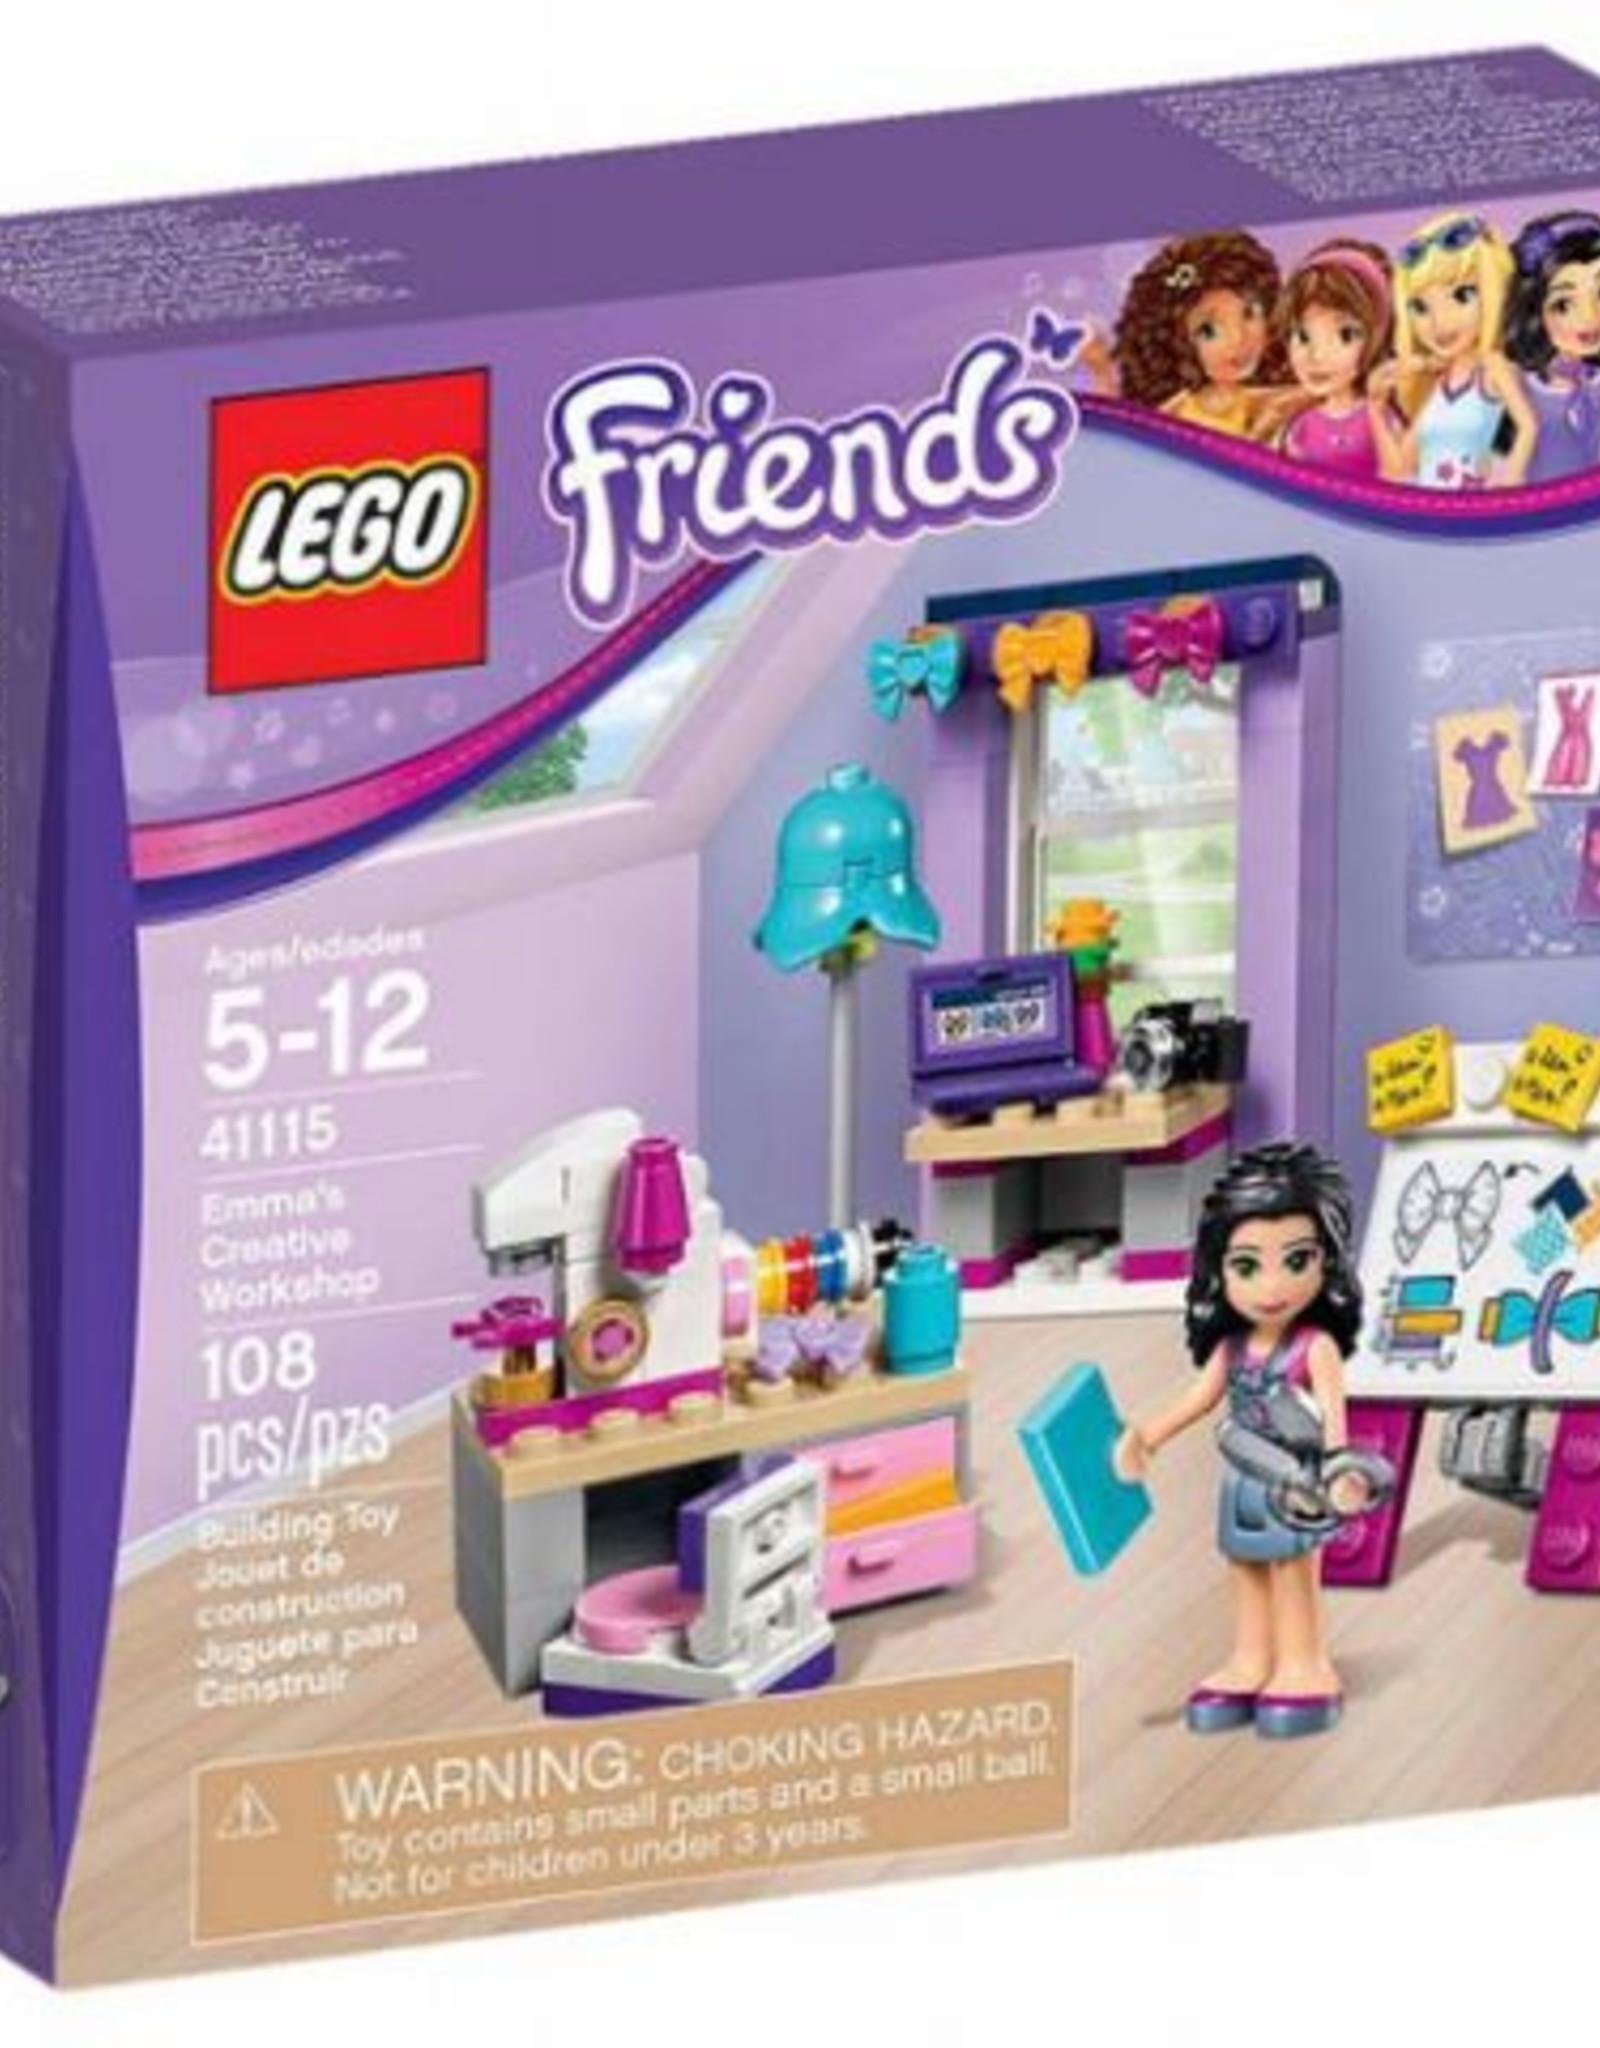 LEGO LEGO 41115 Emma's Creative Workshop FRIENDS